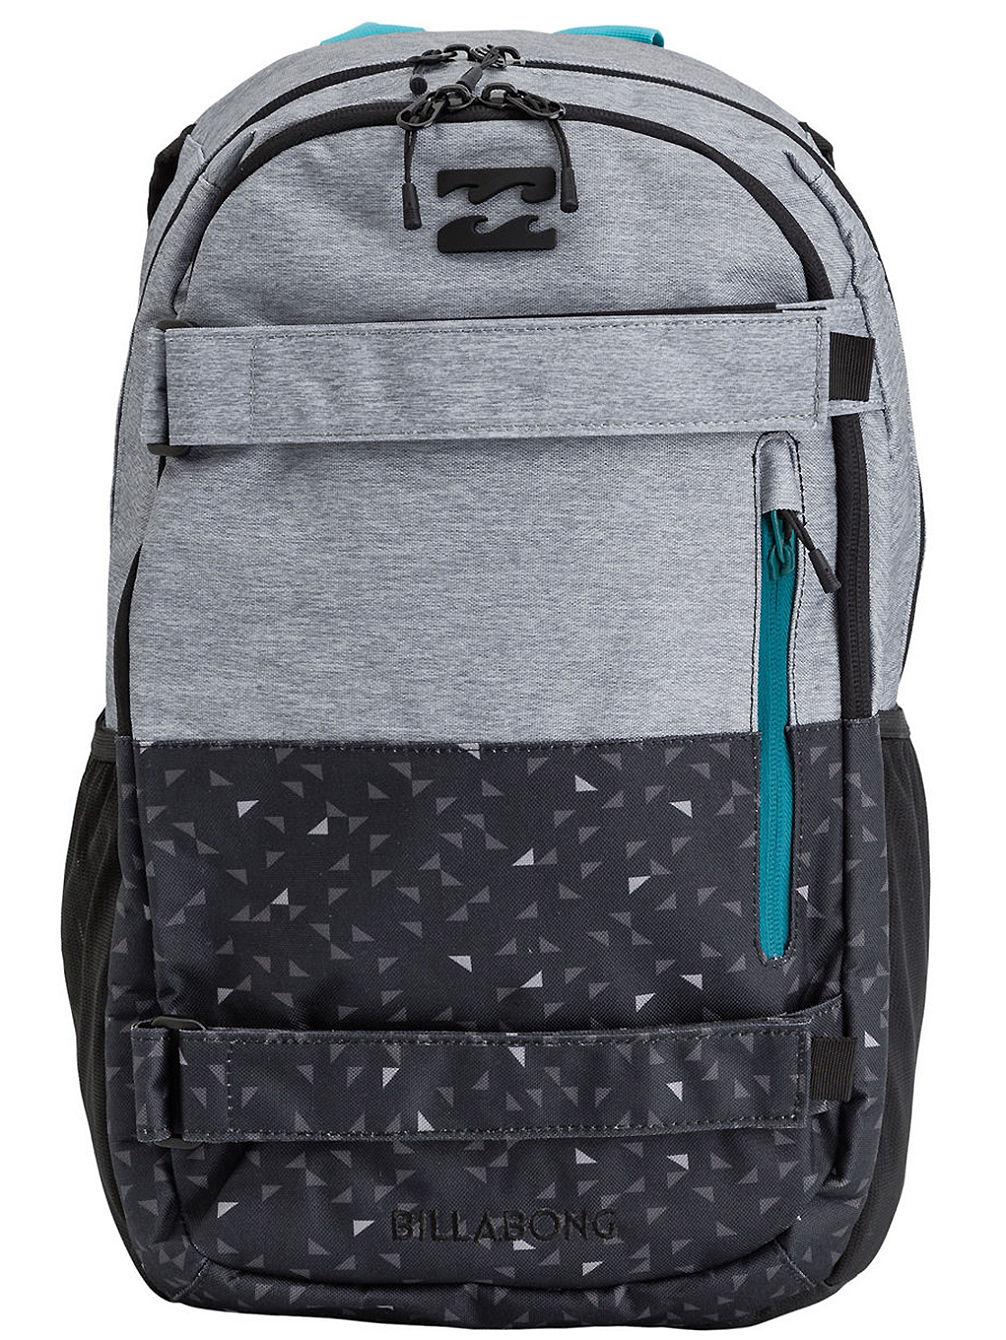 billabong-comply-backpack